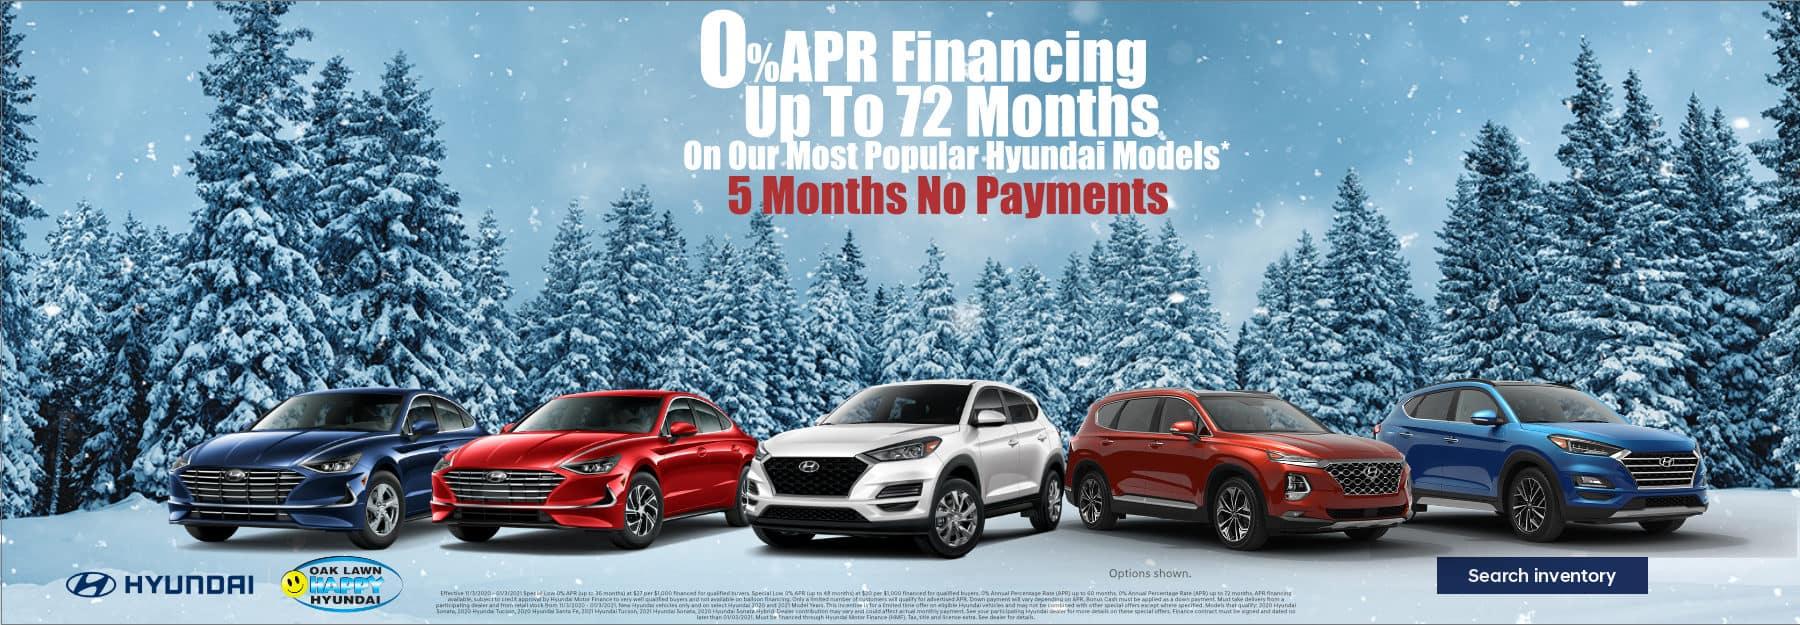 R_December-2020 General_Happy_Hyundai_Updated_1400x514